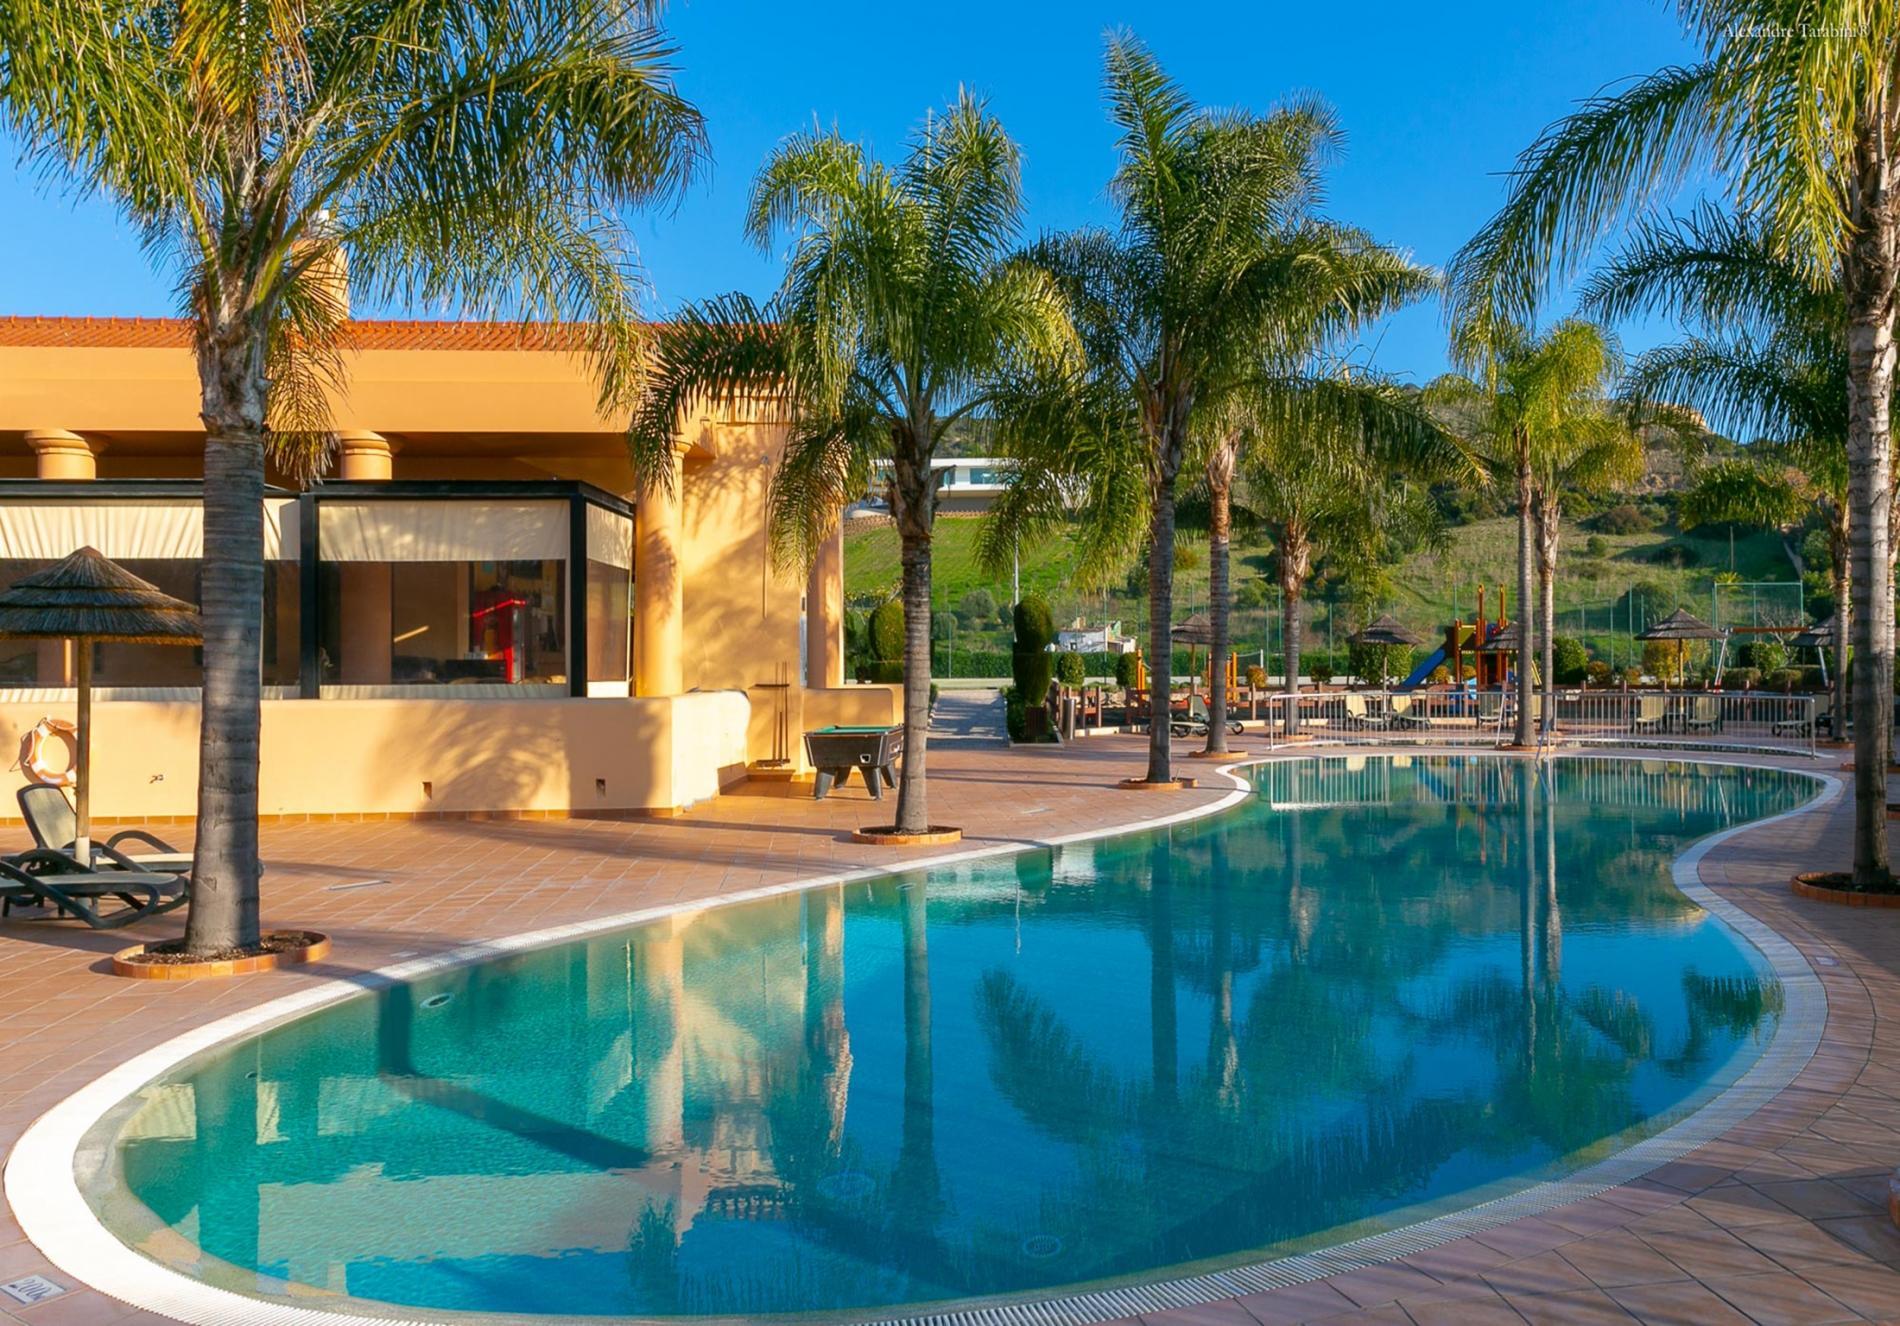 Ferienwohnung A24 - LuzBay Beach Apartment (2558091), Luz, , Algarve, Portugal, Bild 22